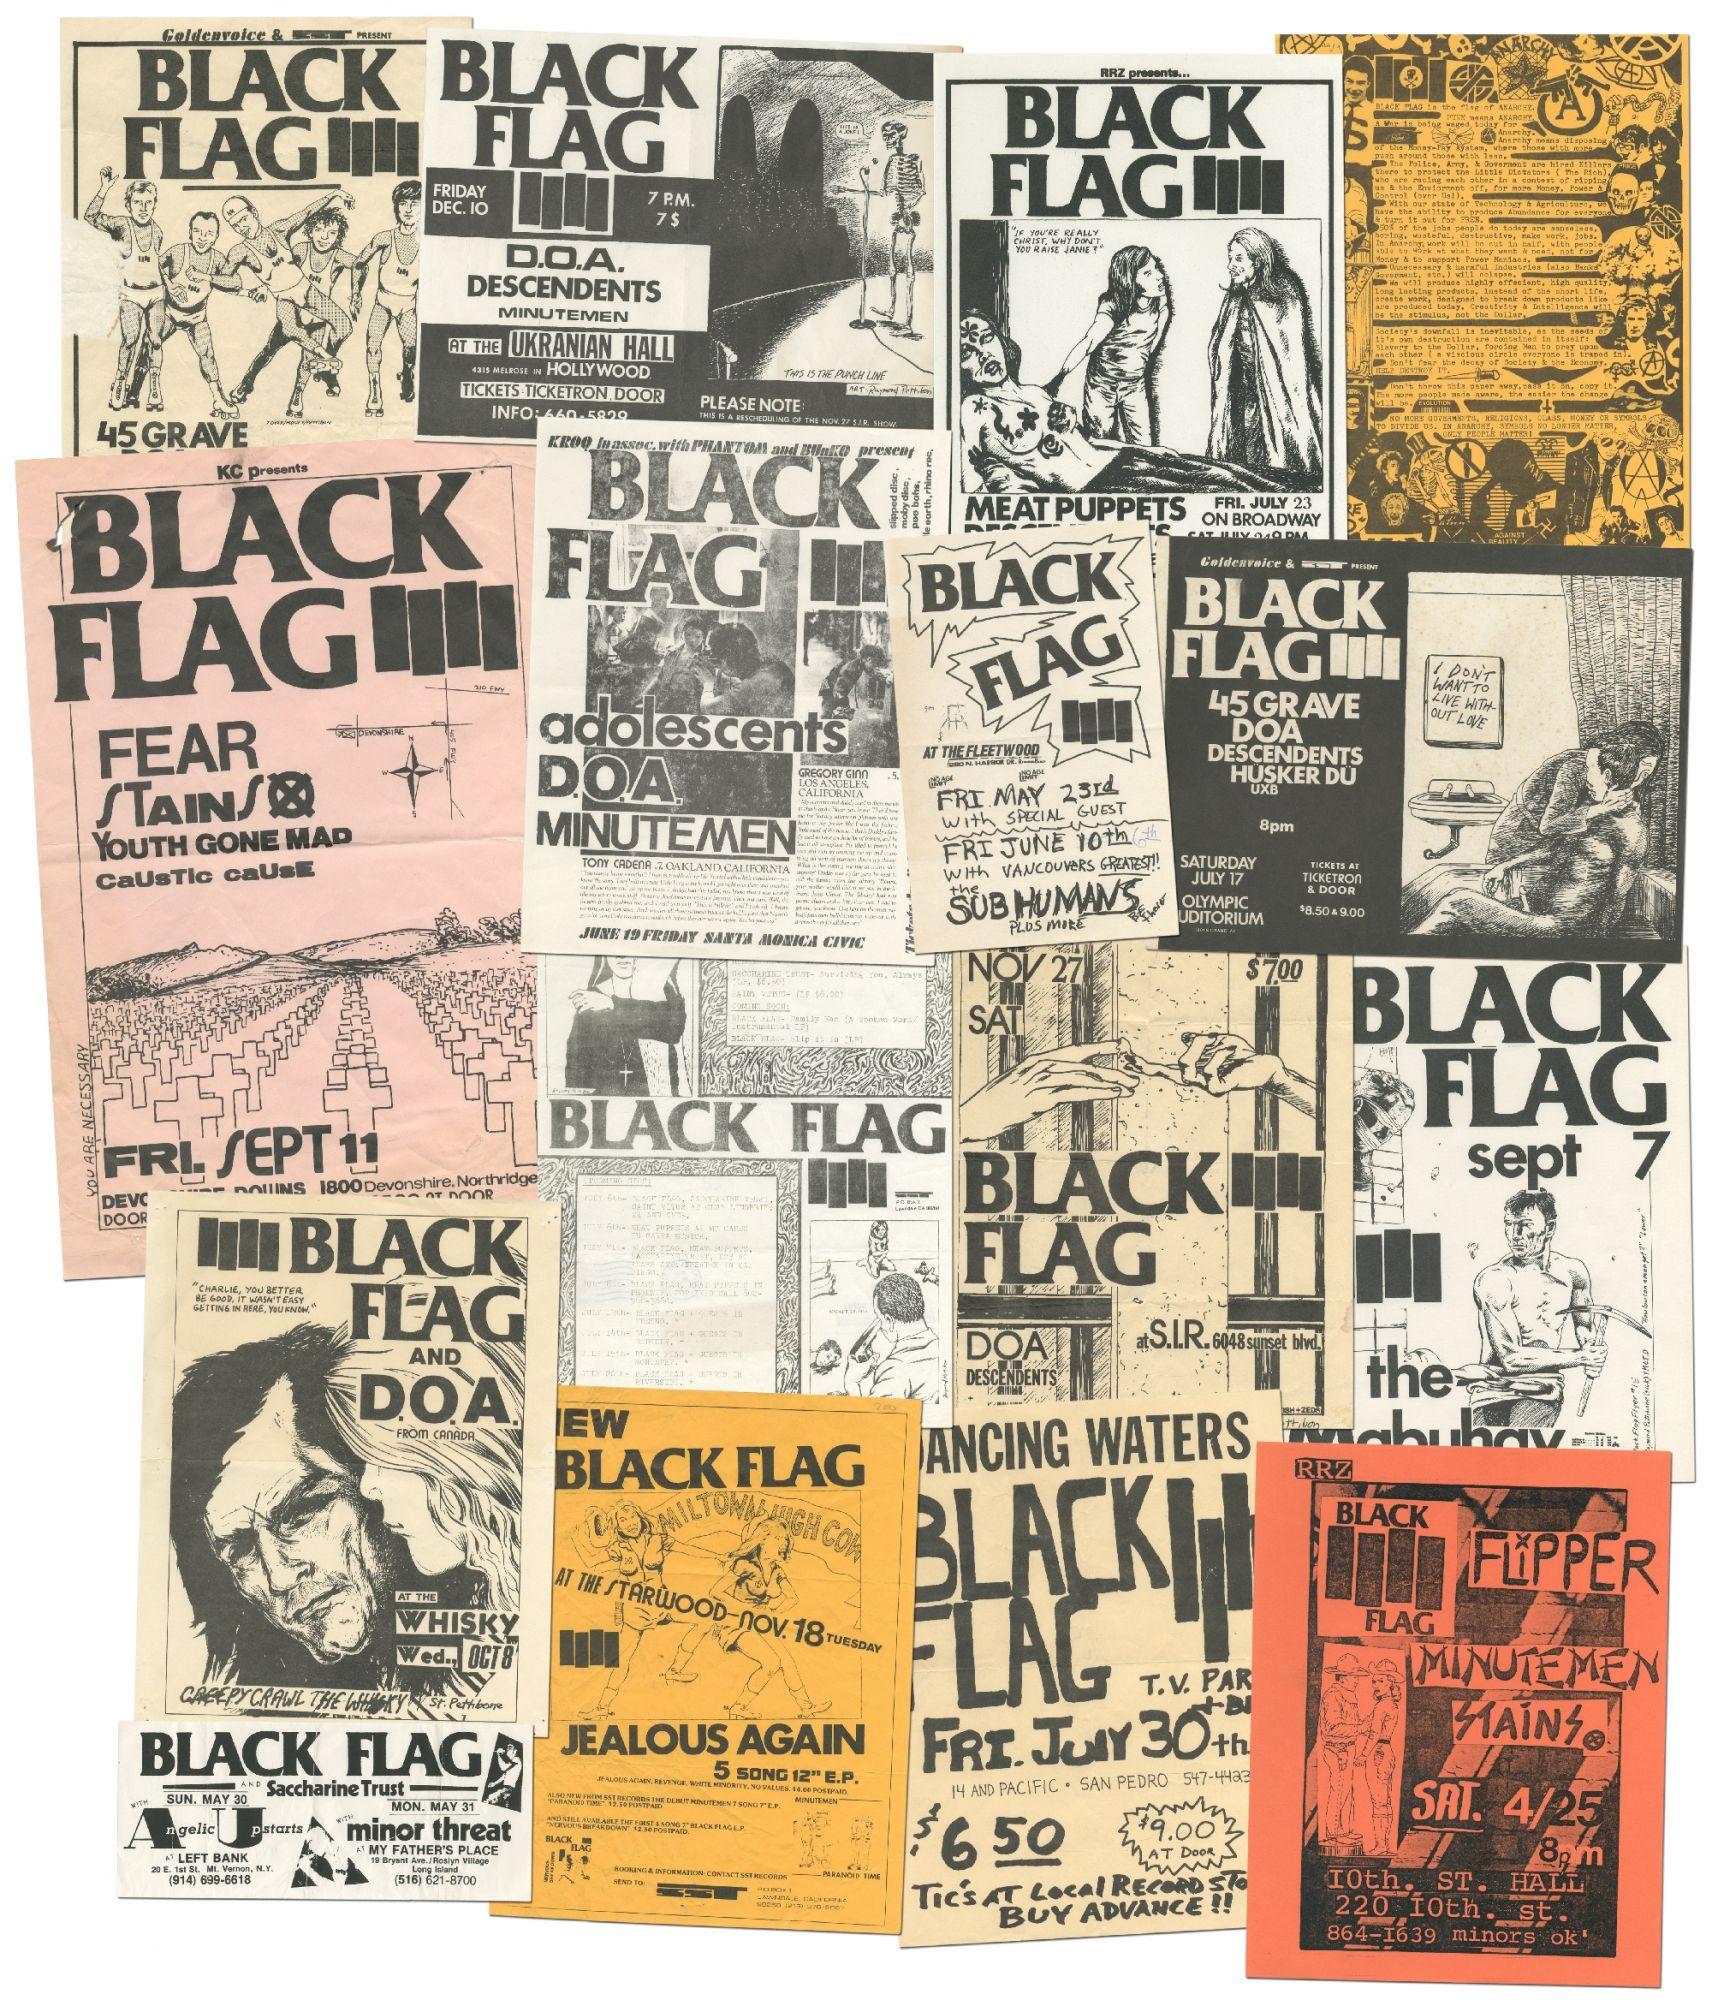 16 Black Flag Flyers Raymond PETTIBON, Black Flag